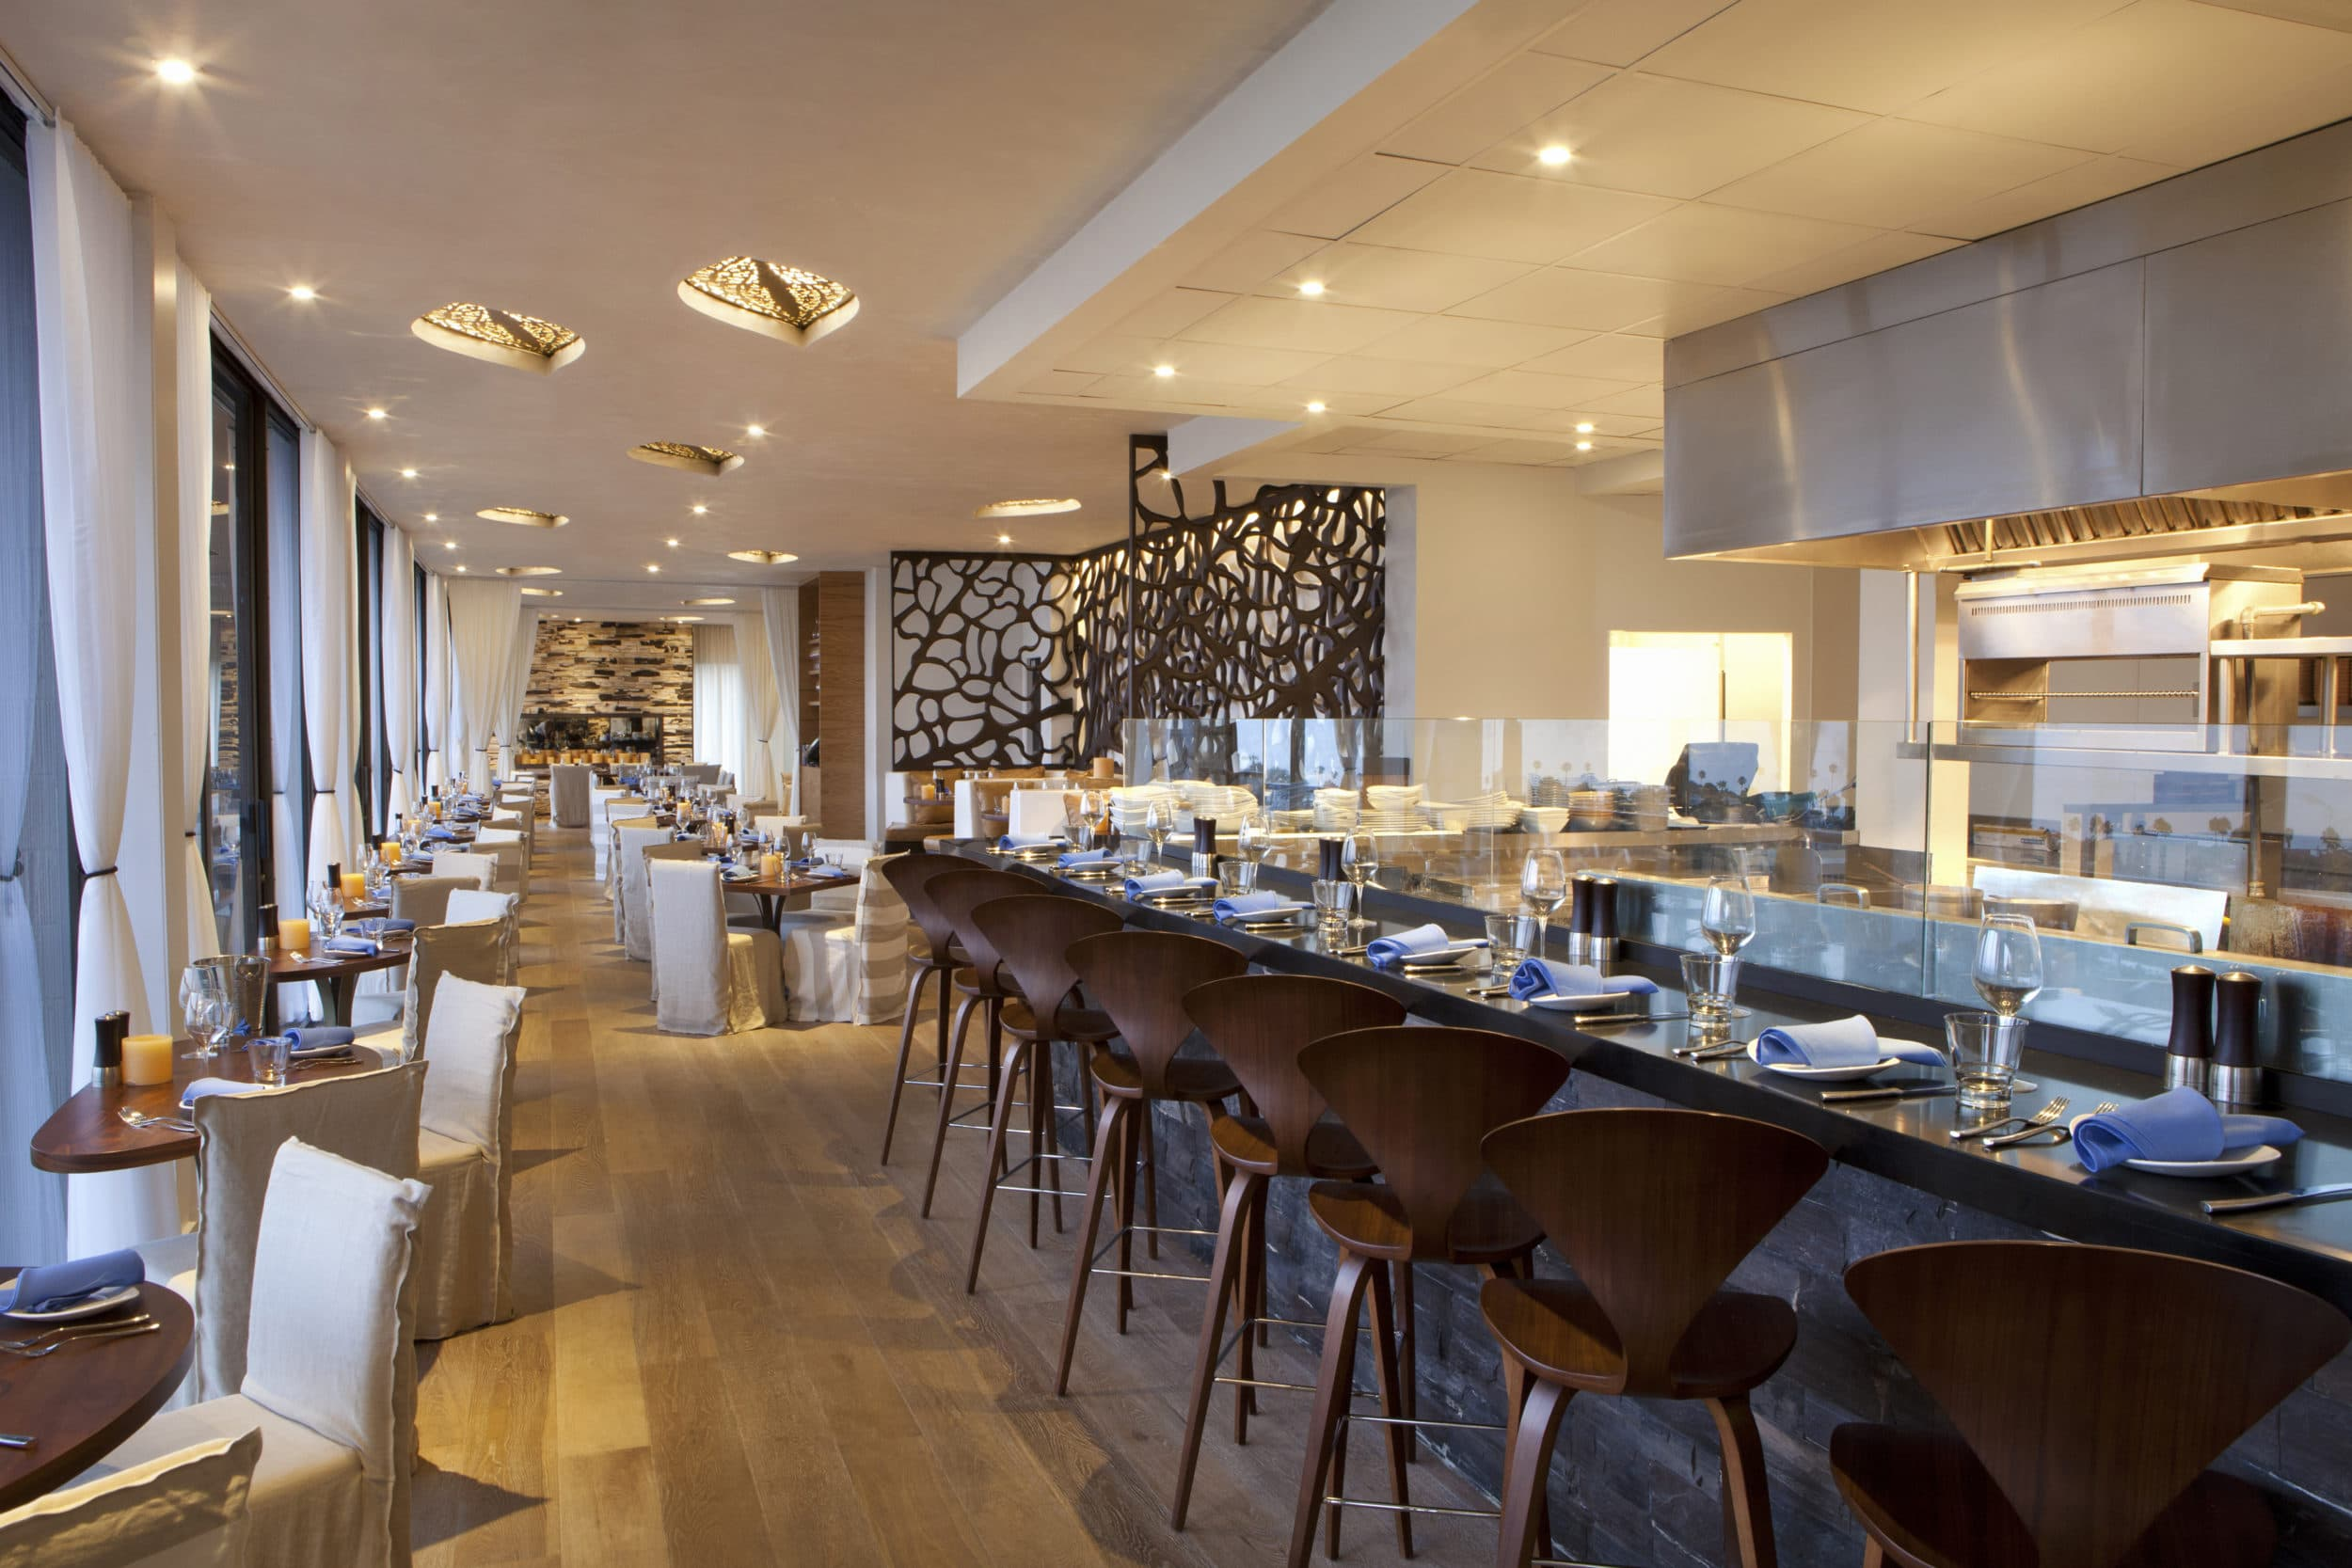 Contemporary interior of CUSP Dining and Drinks inside Hotel La Jolla.